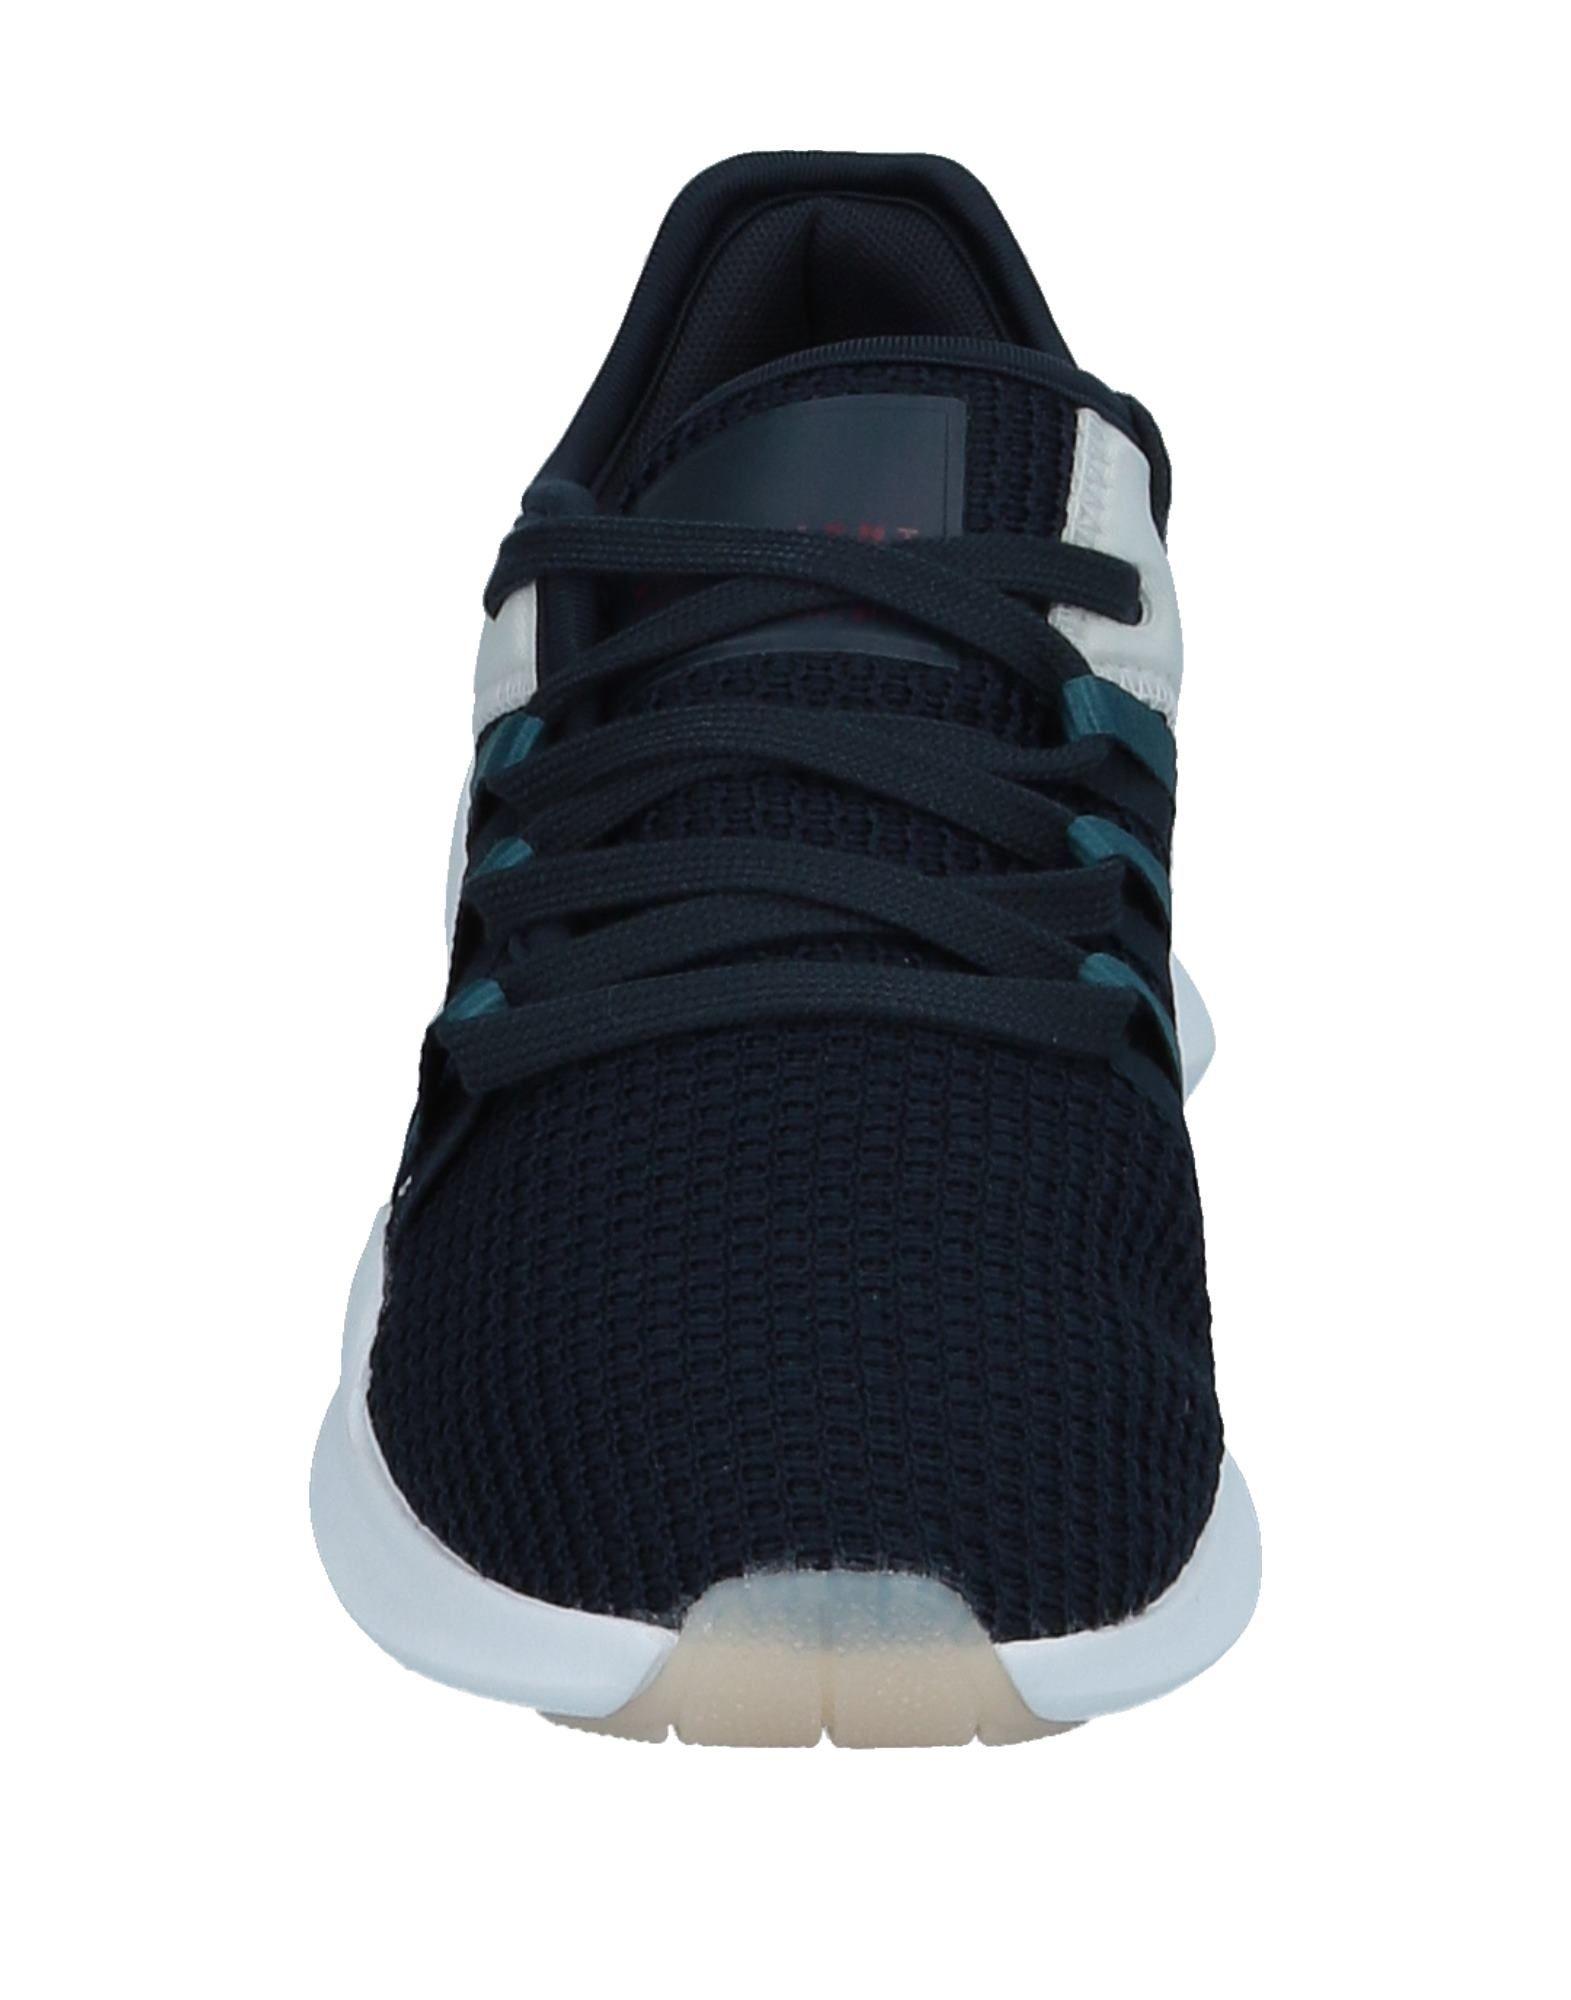 Adidas Originals Sneakers Damen    11537227DA Gute Qualität beliebte Schuhe 849db6